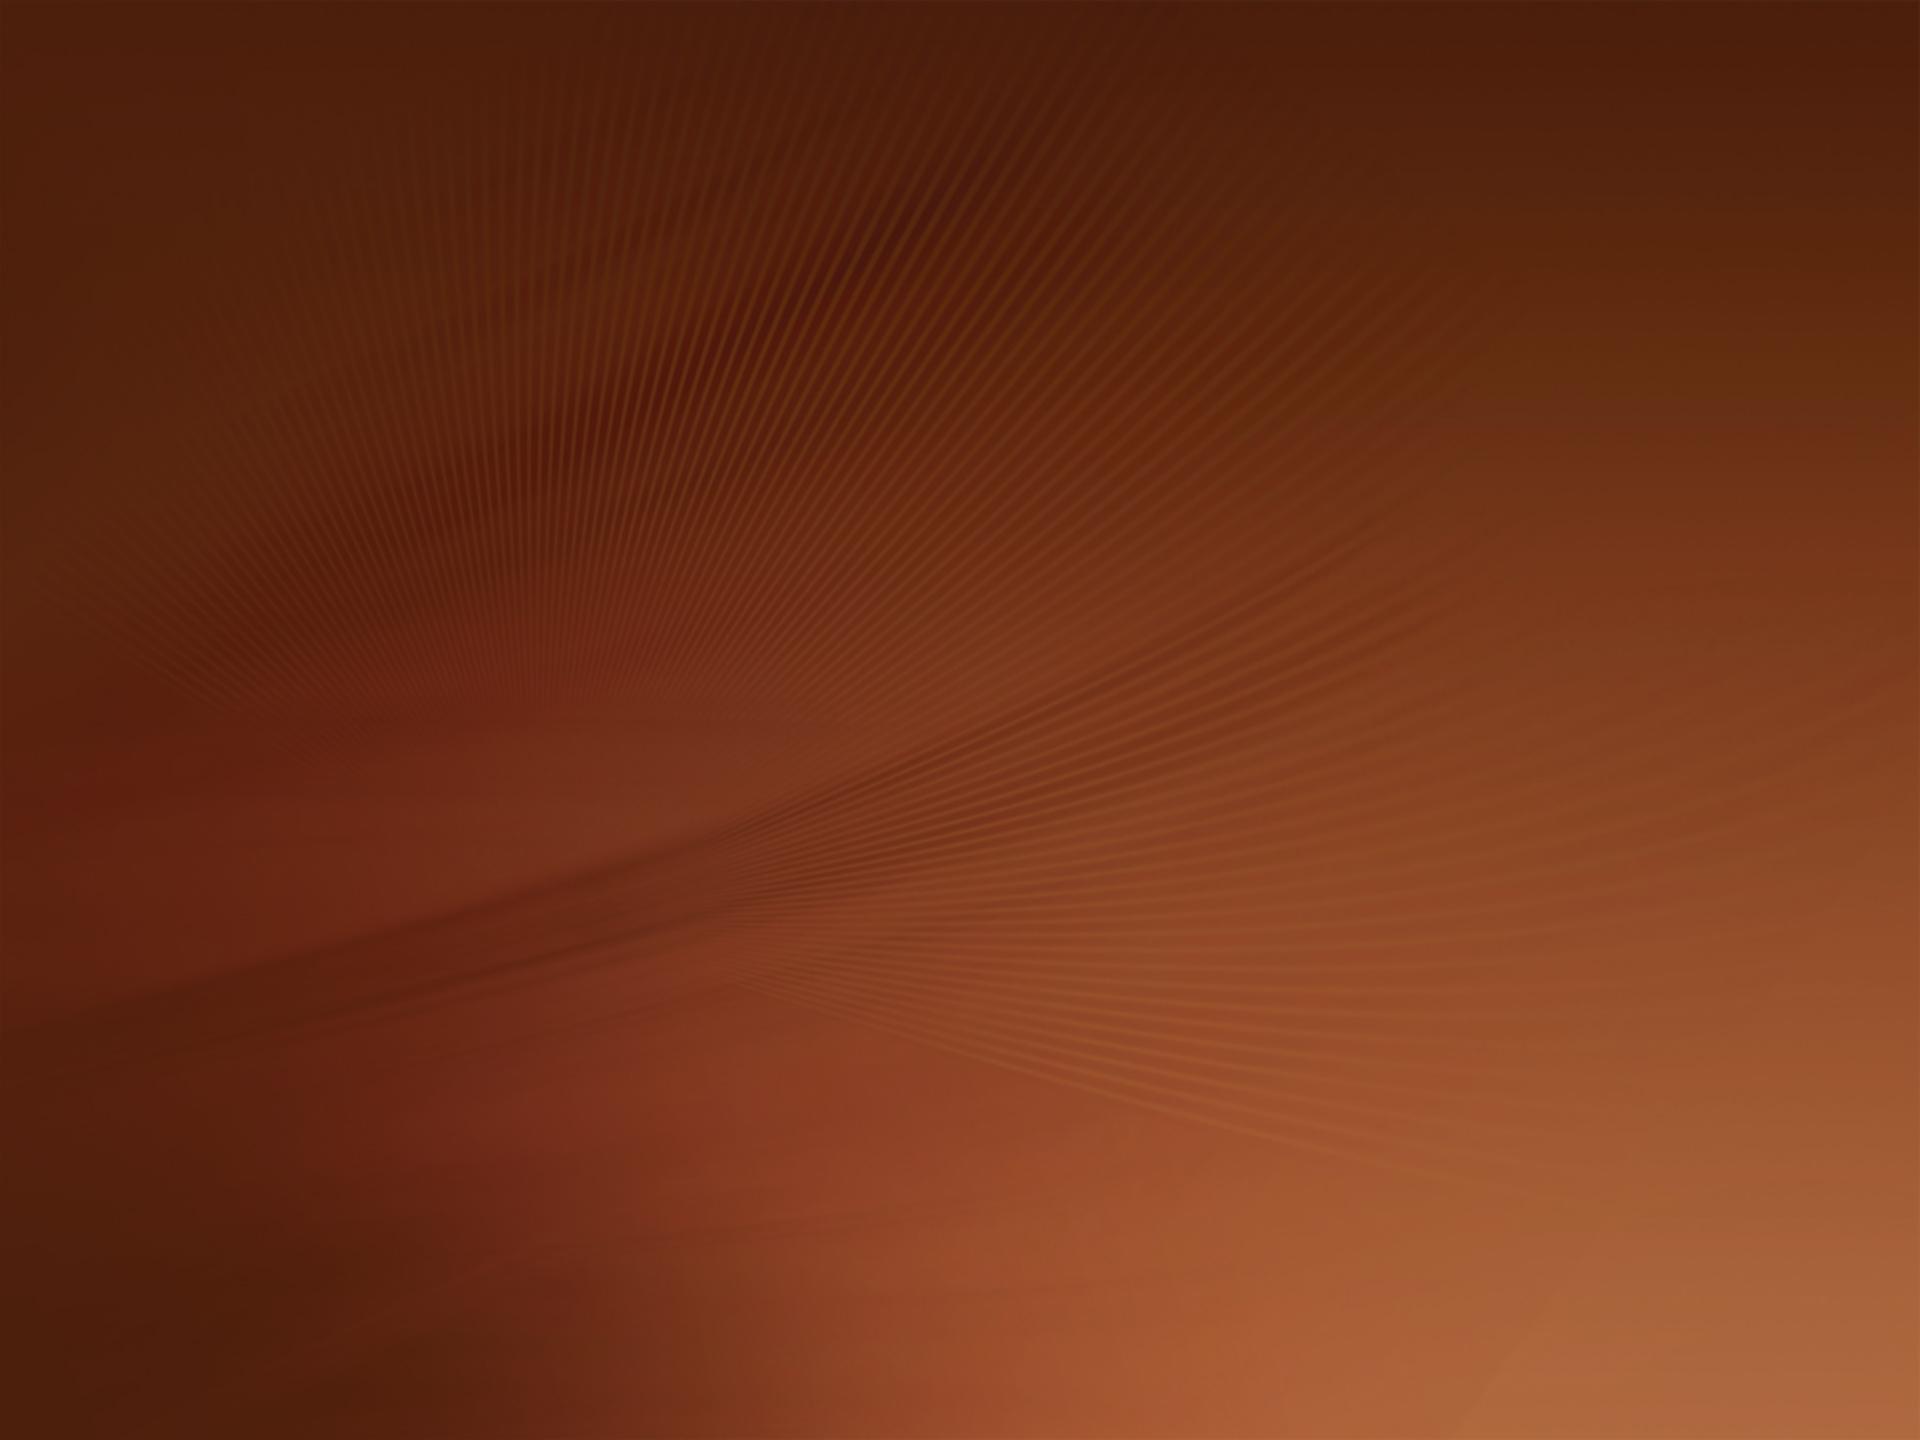 Ubuntu Wallpaper 1920x1440